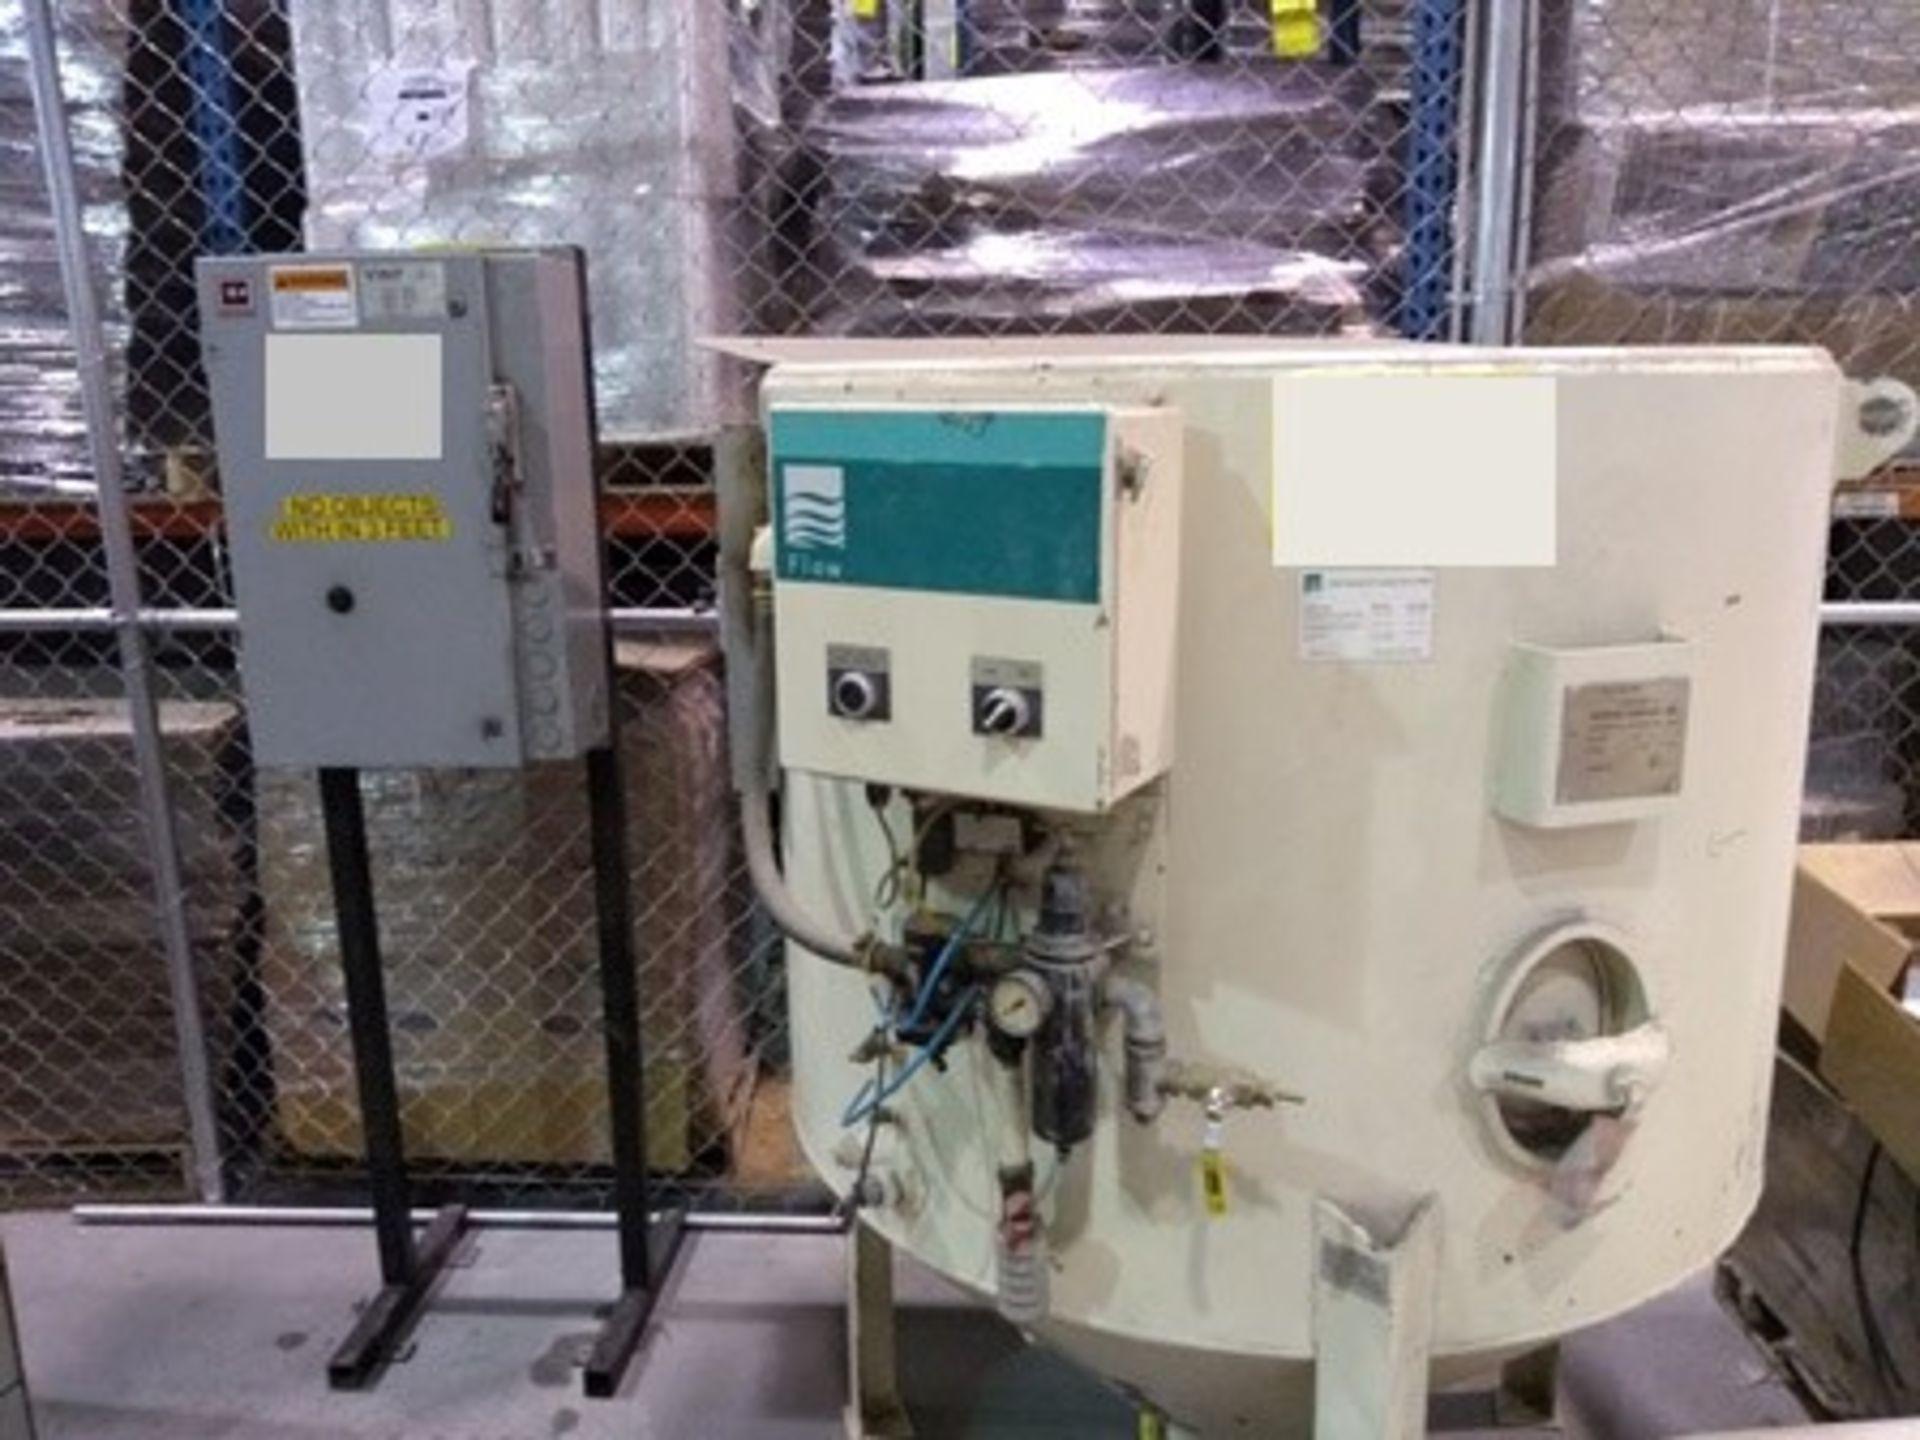 Lot 14 - Flow Waterknife 7x, Intensifier Waterjet Pump: 60,000 PSI Operating Pressure, Mawp 483 kpg, ser …